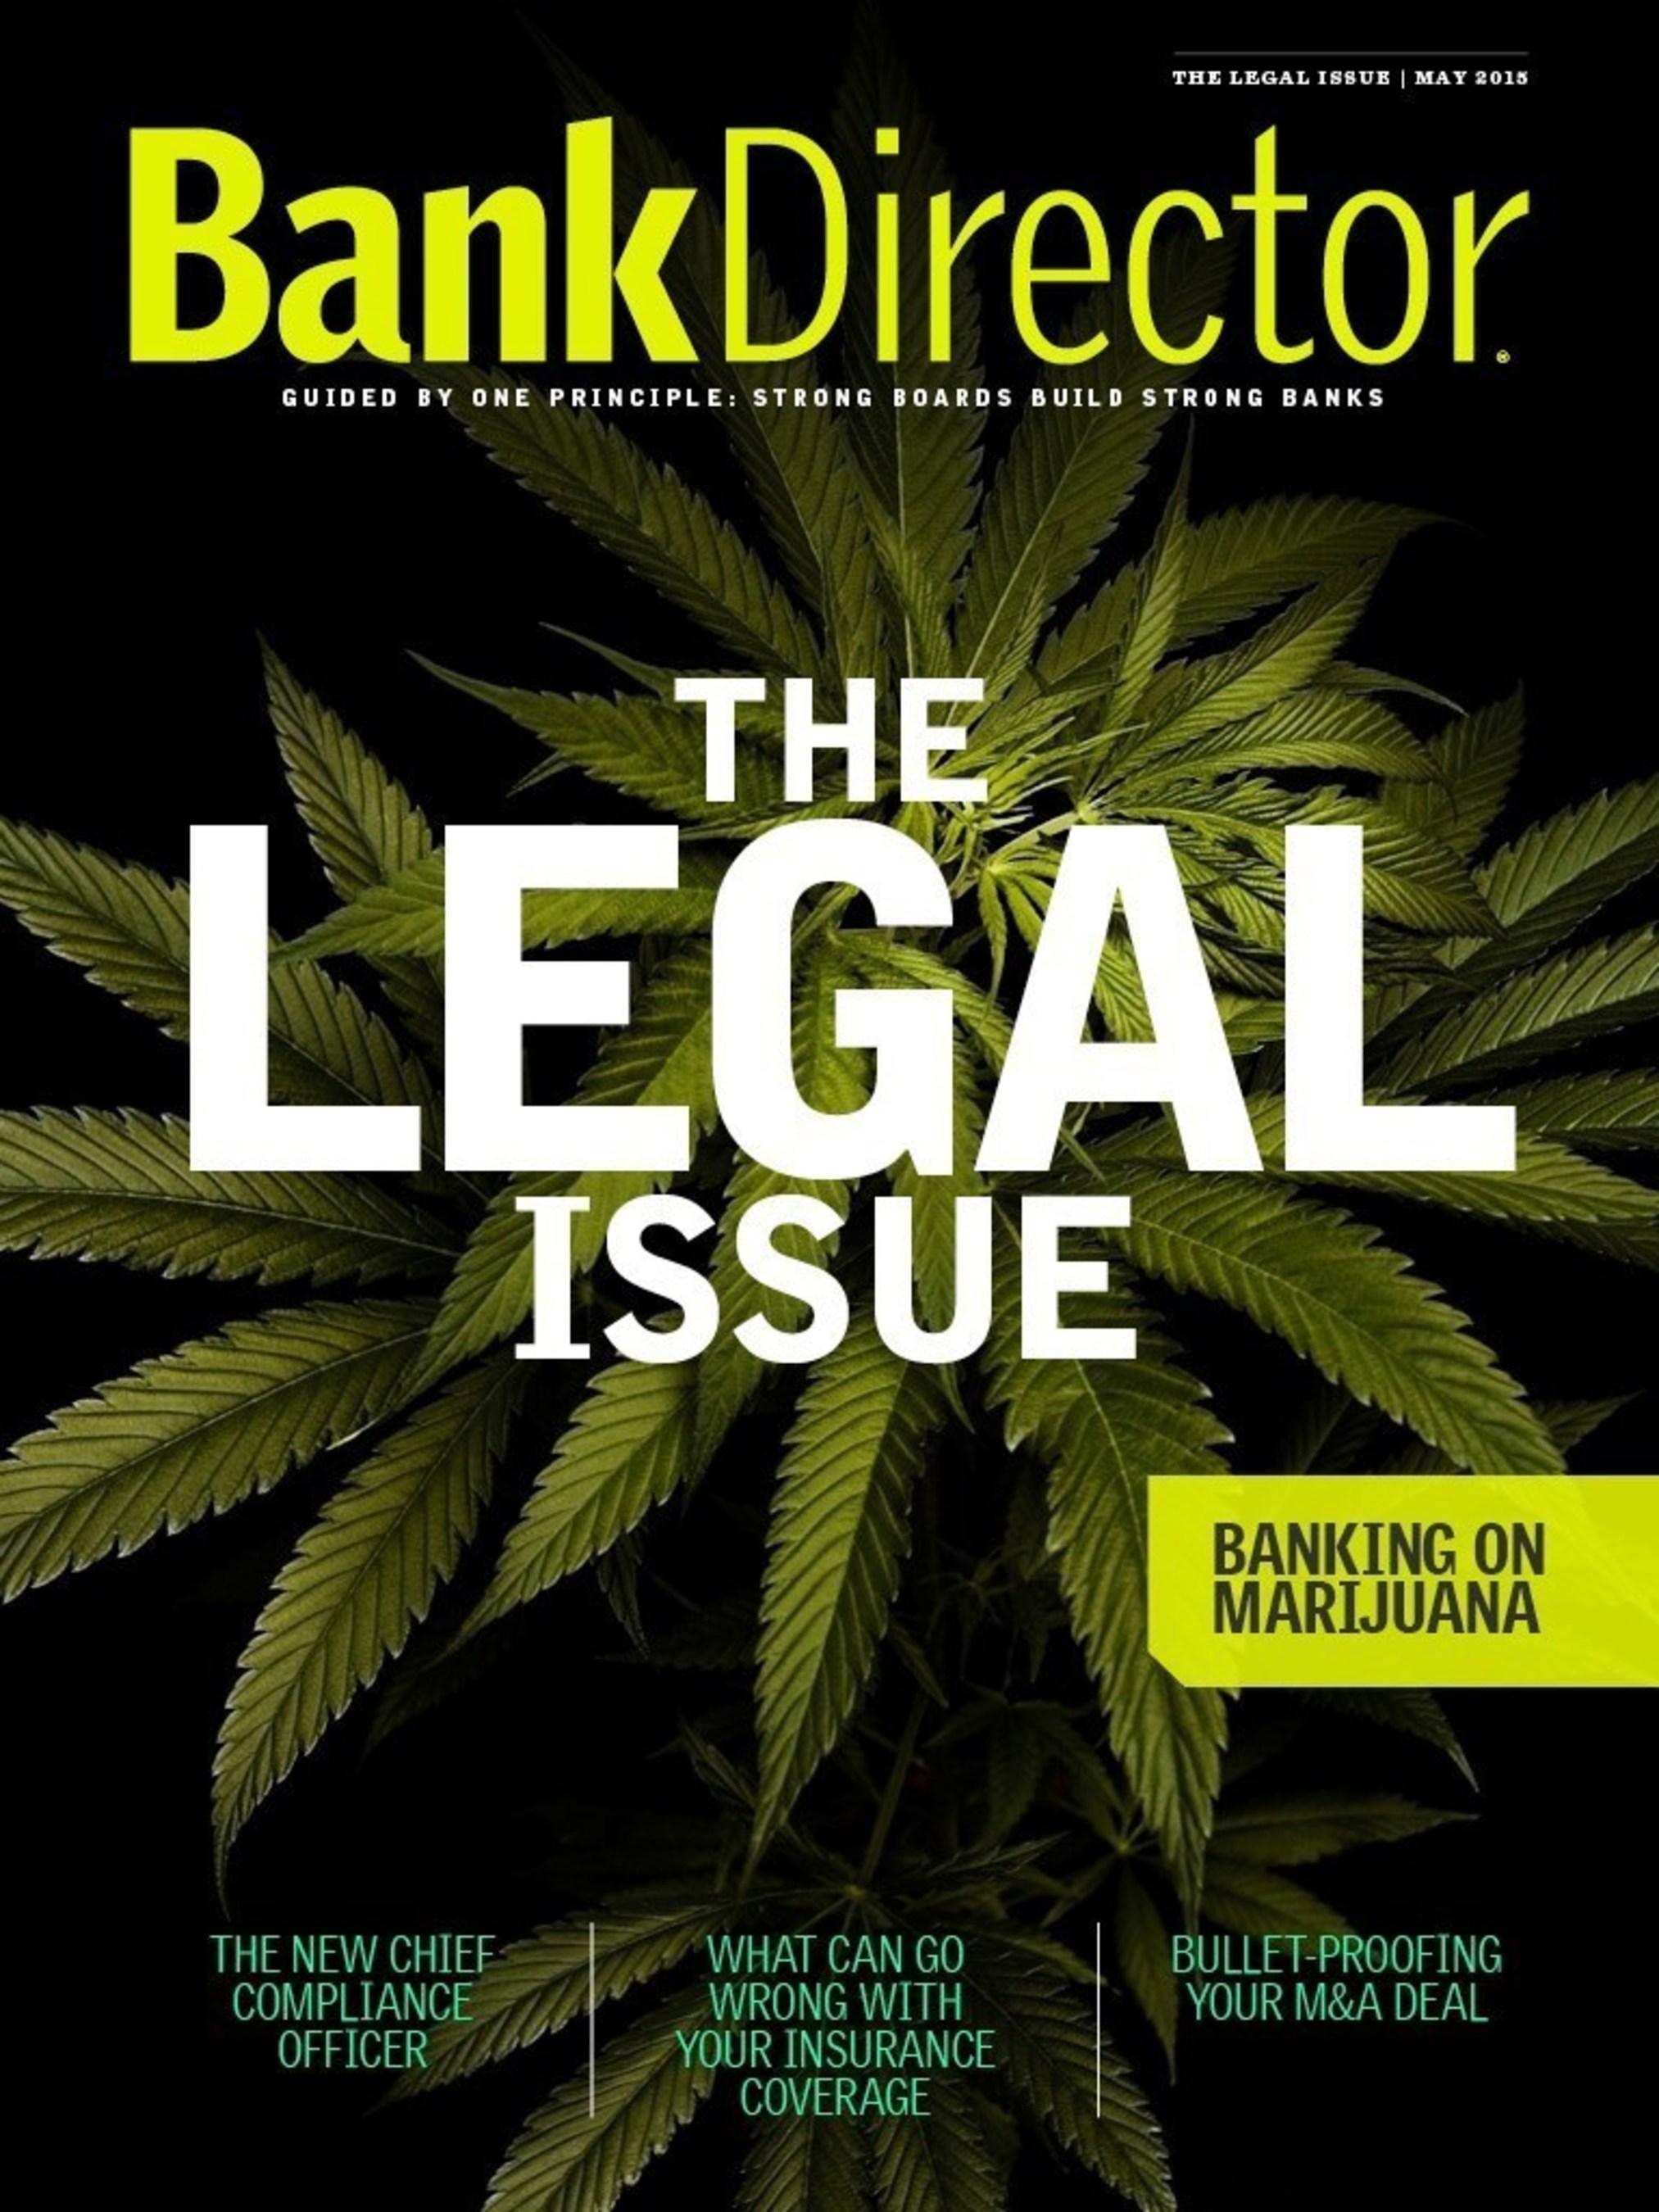 BankDirector May 2015 Digital Magazine Cover